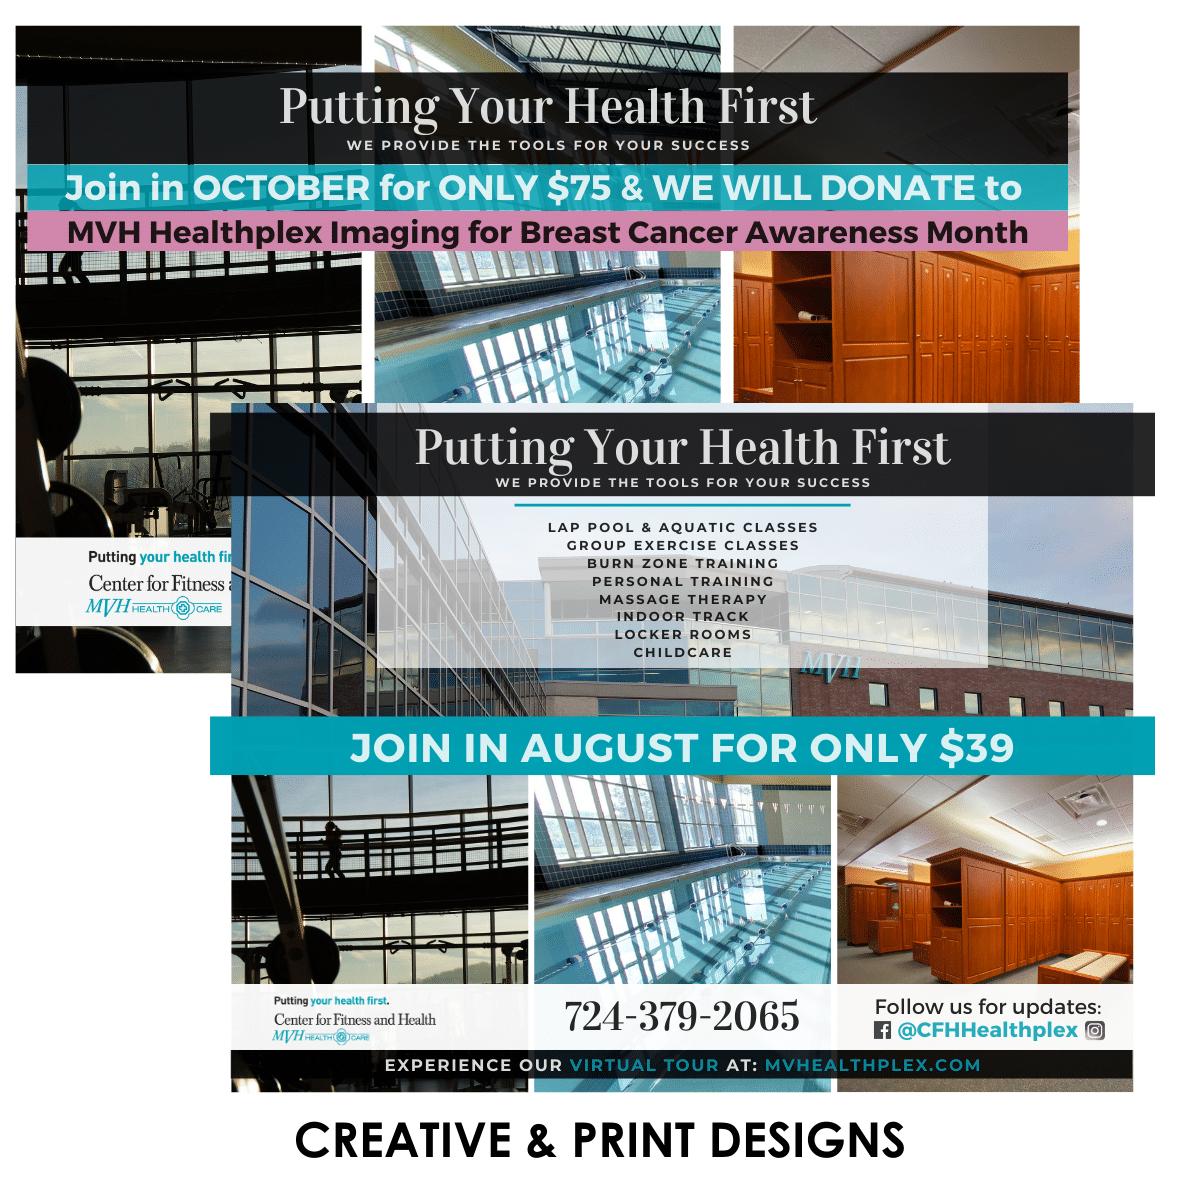 NEW TFM Website - Client Feature Block - CFH - Print Design_1200x1200